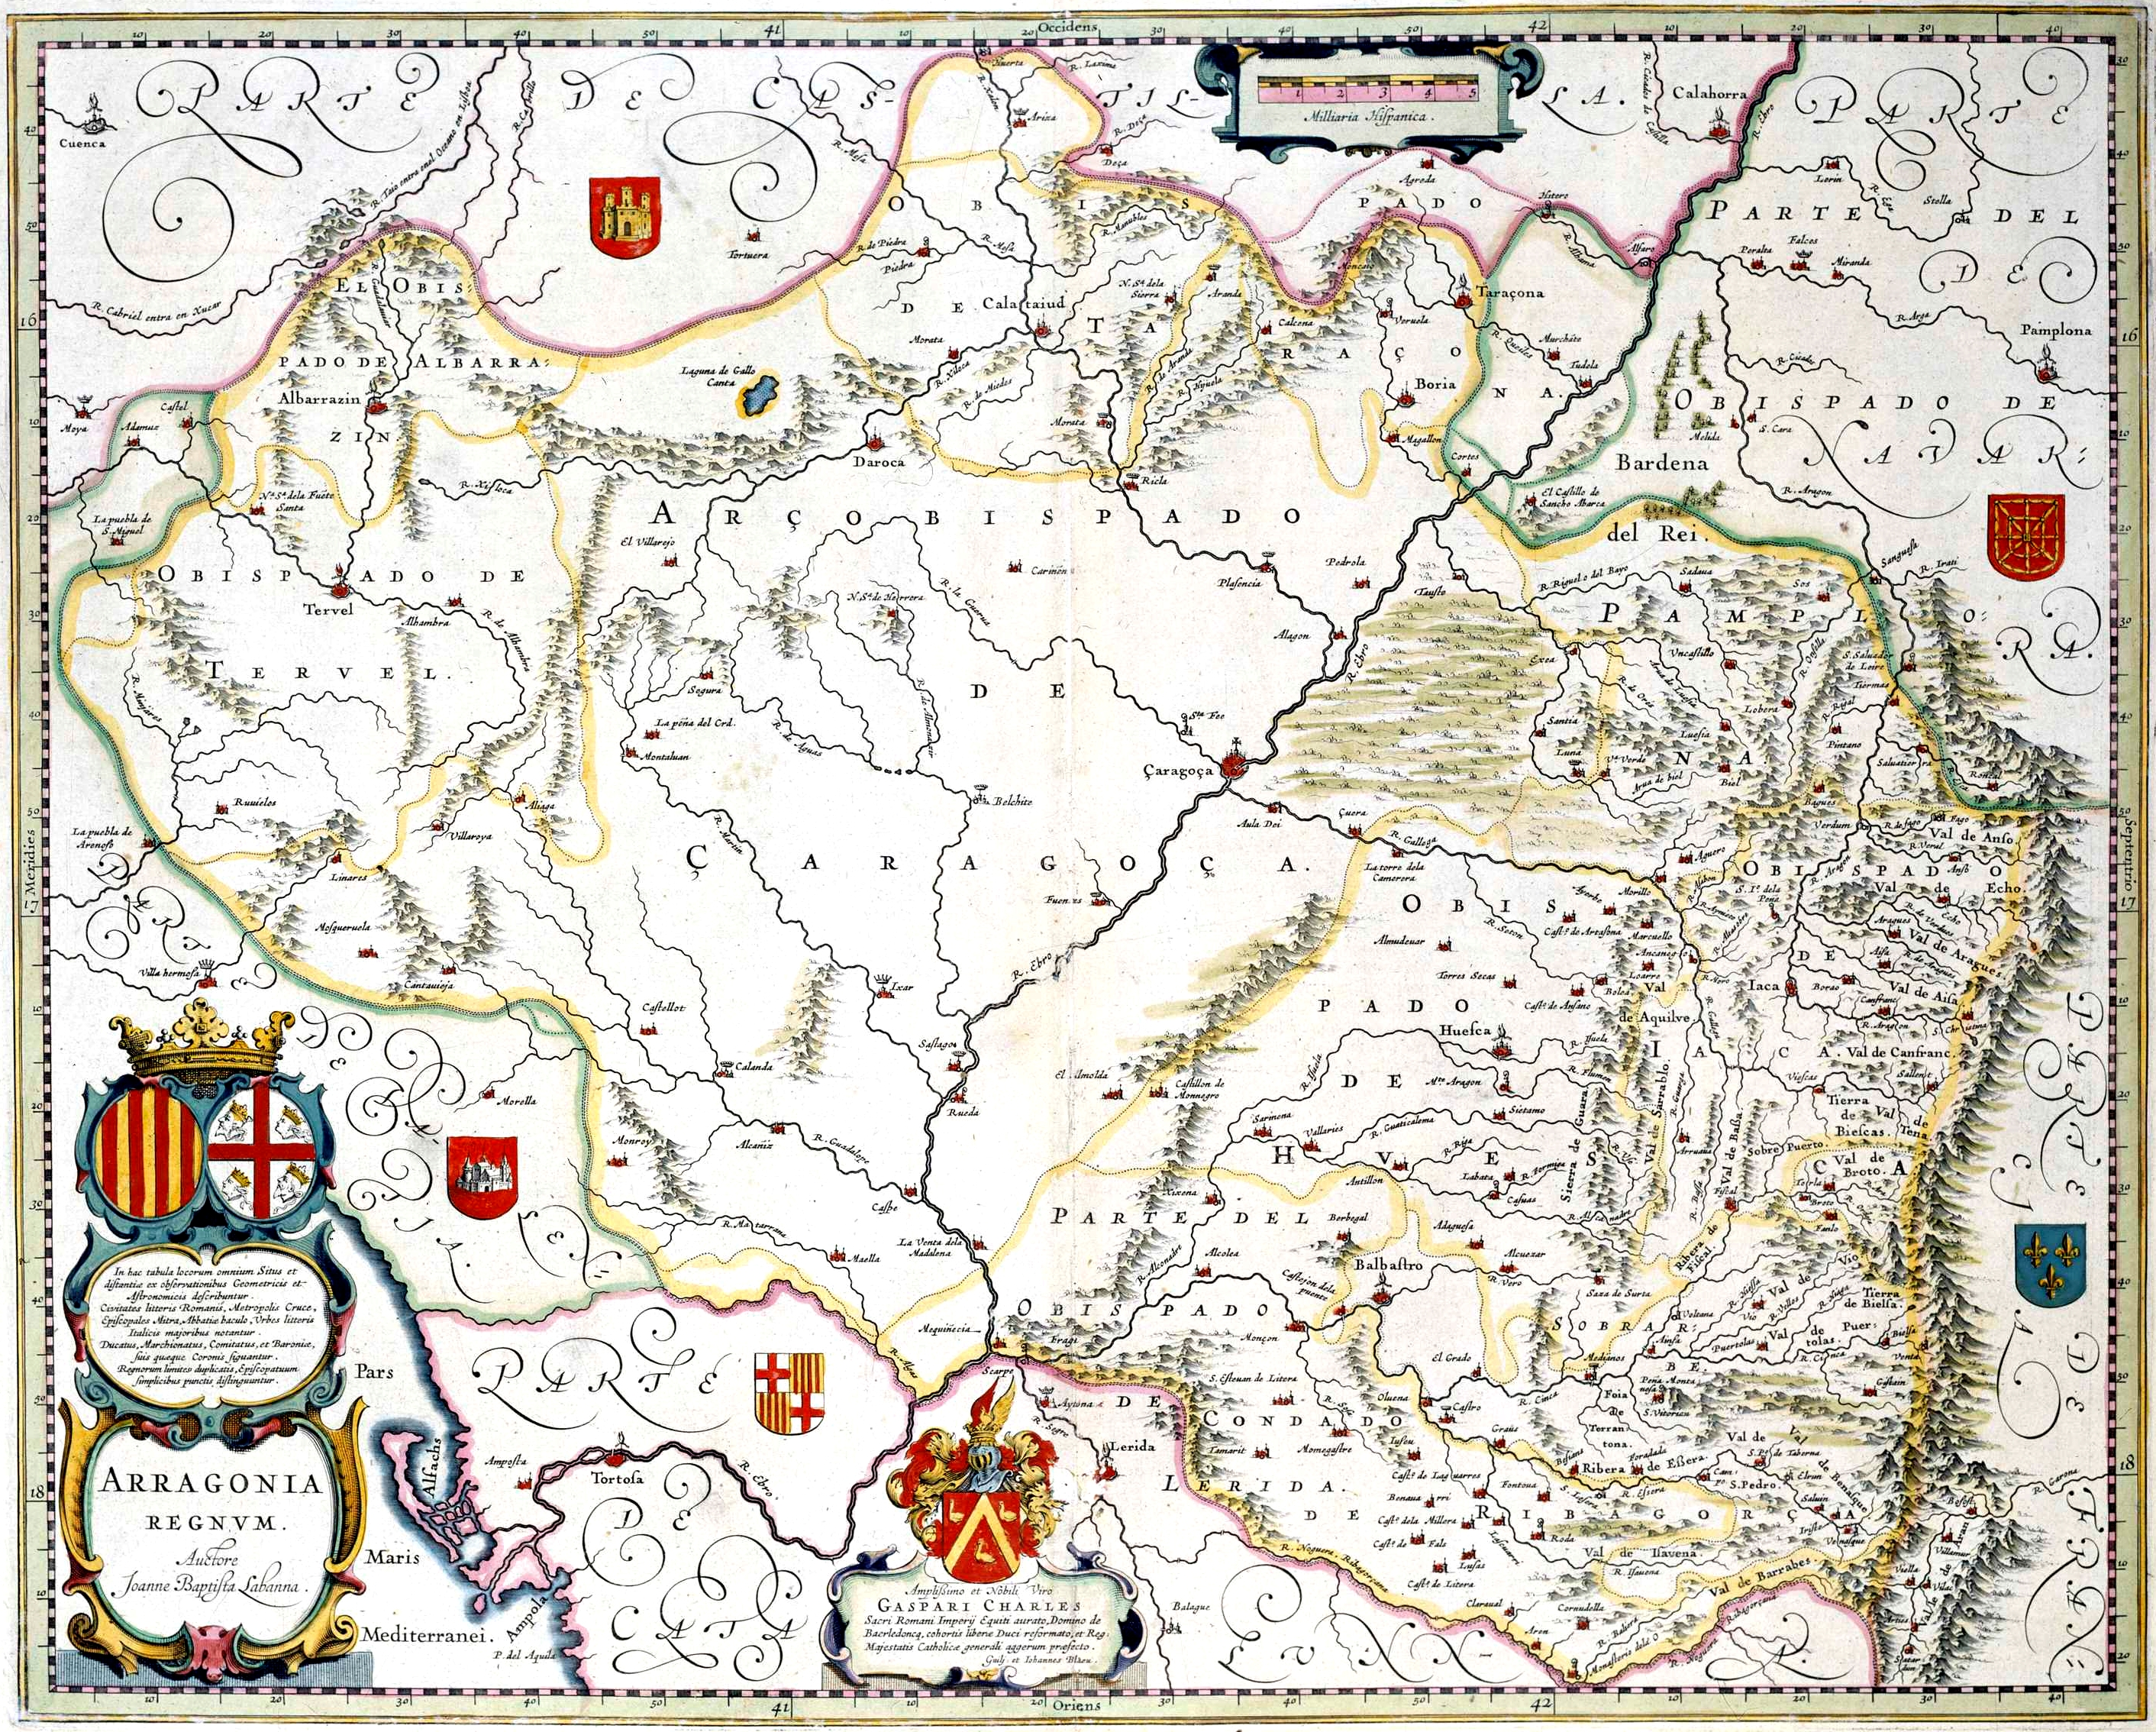 kingdom of Aragon